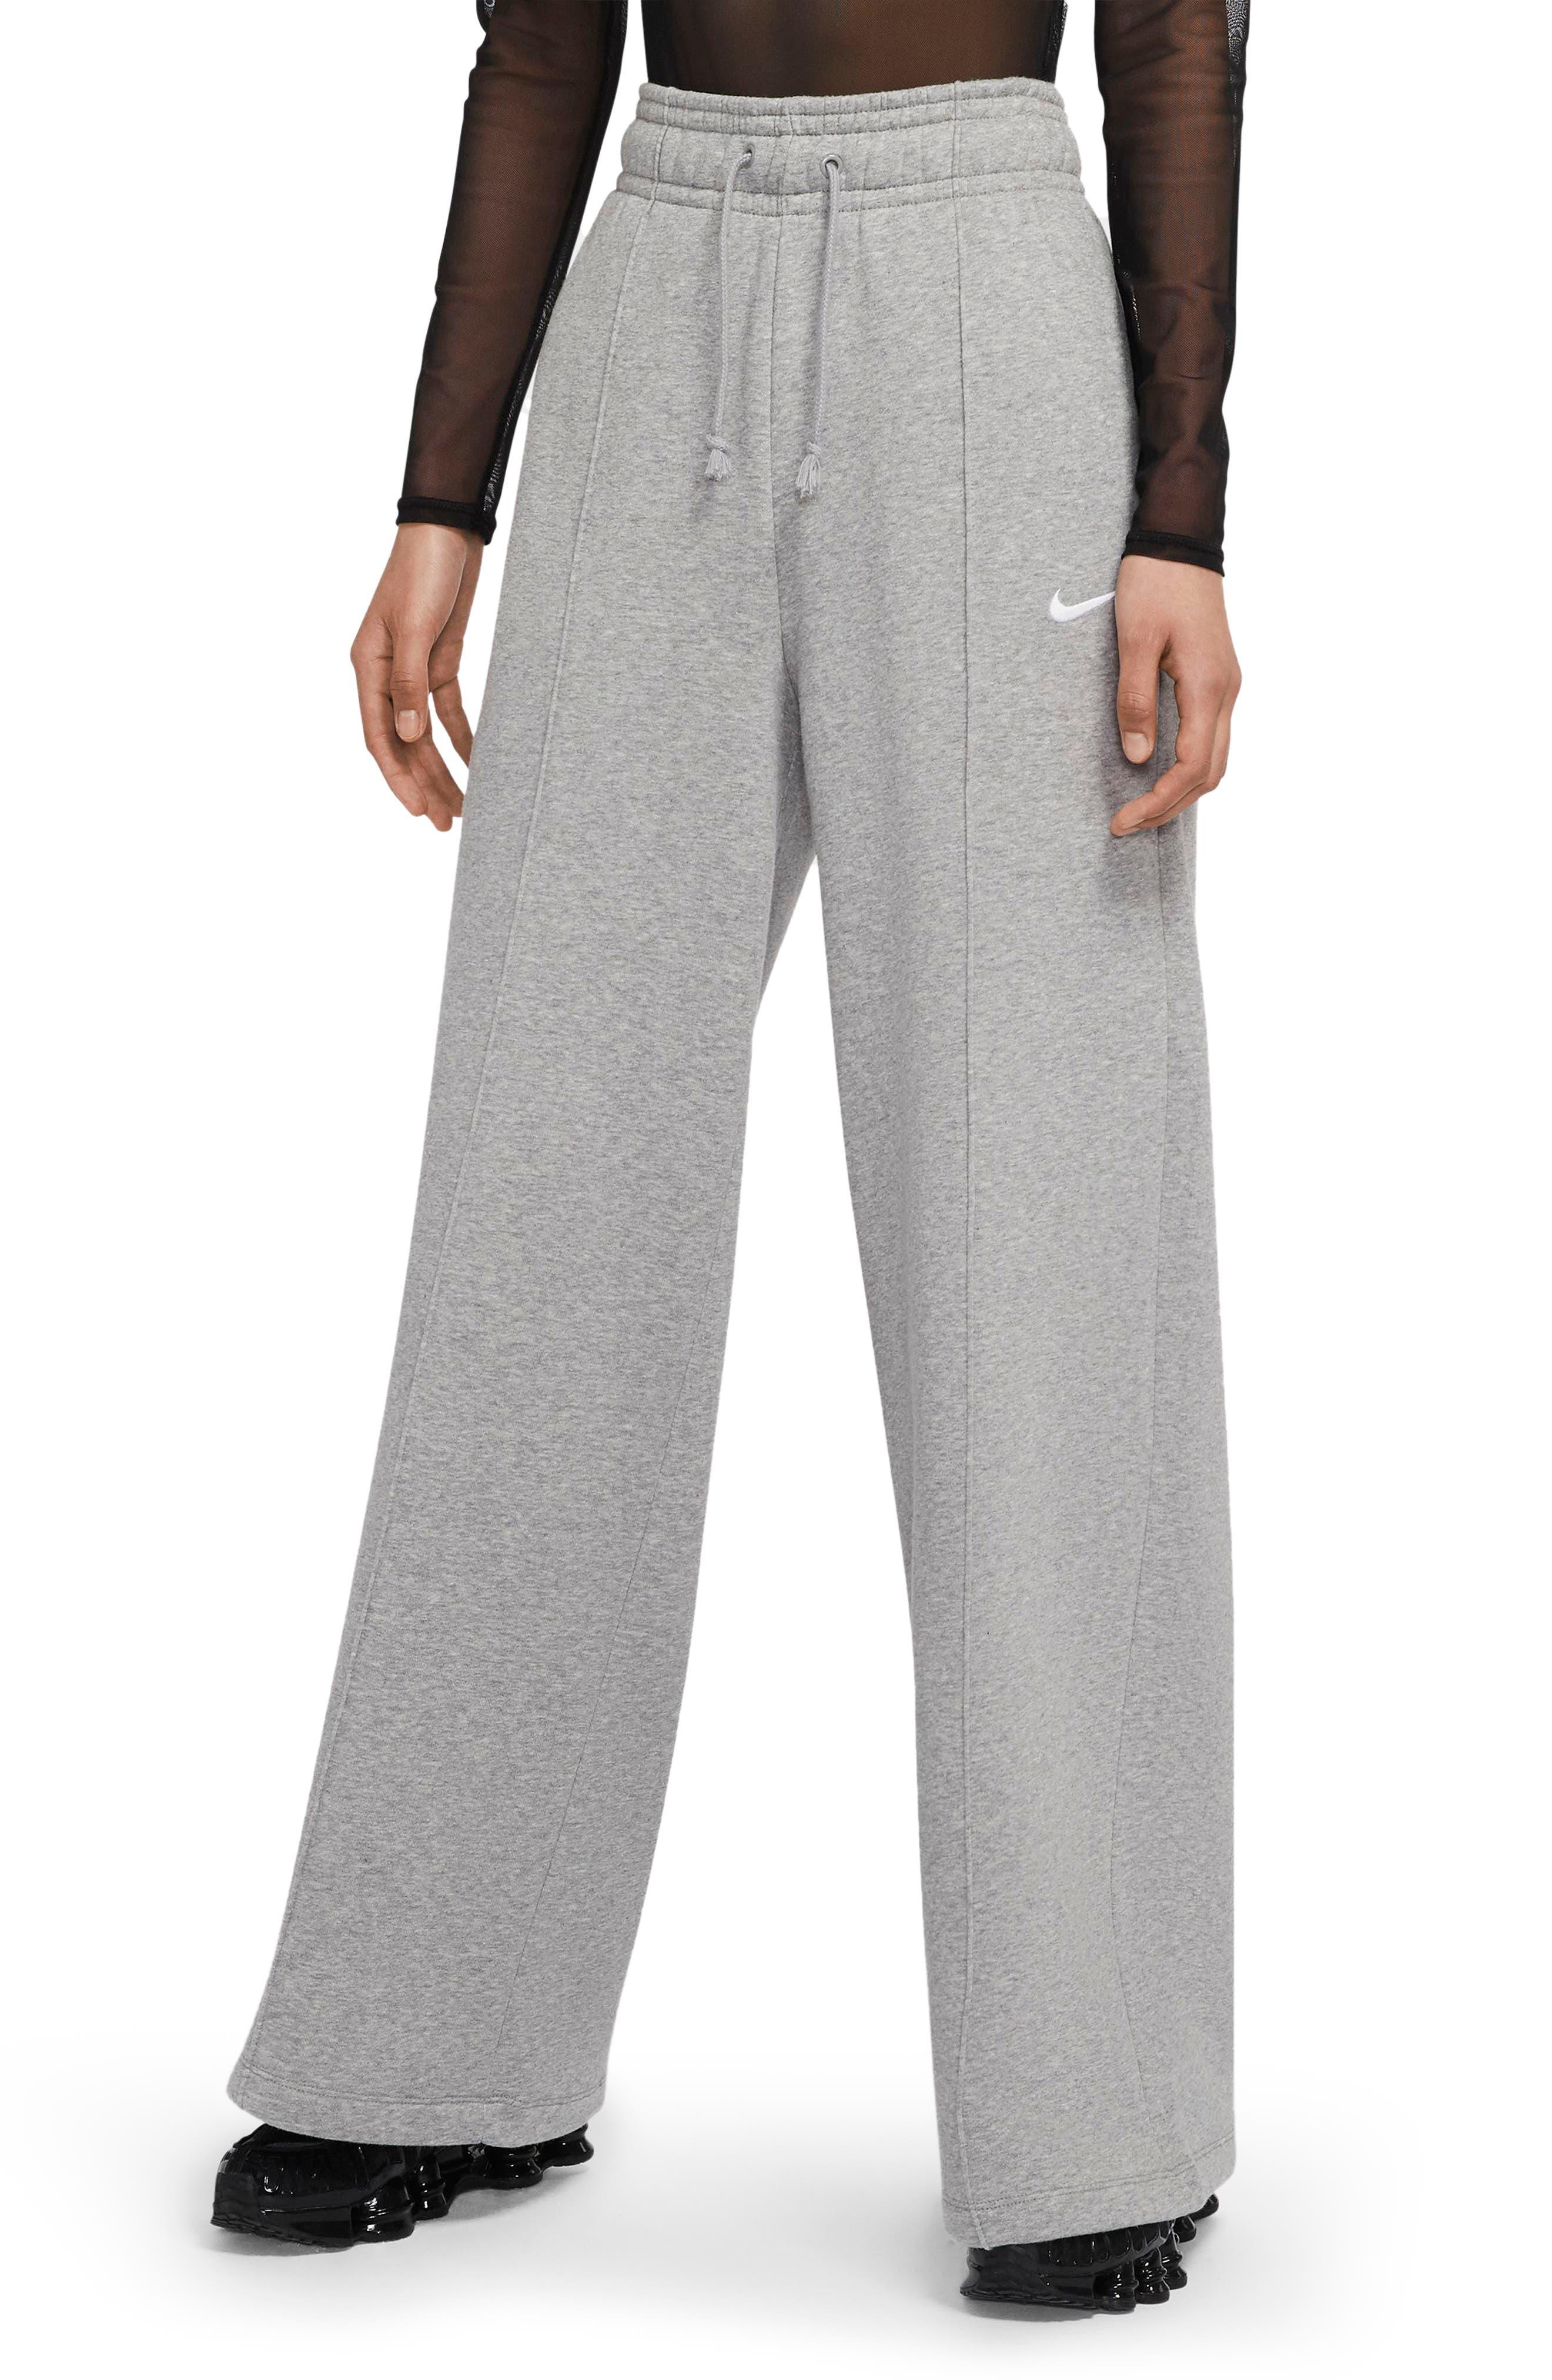 Women's Nike Sportswear Knit Palazzo Pants